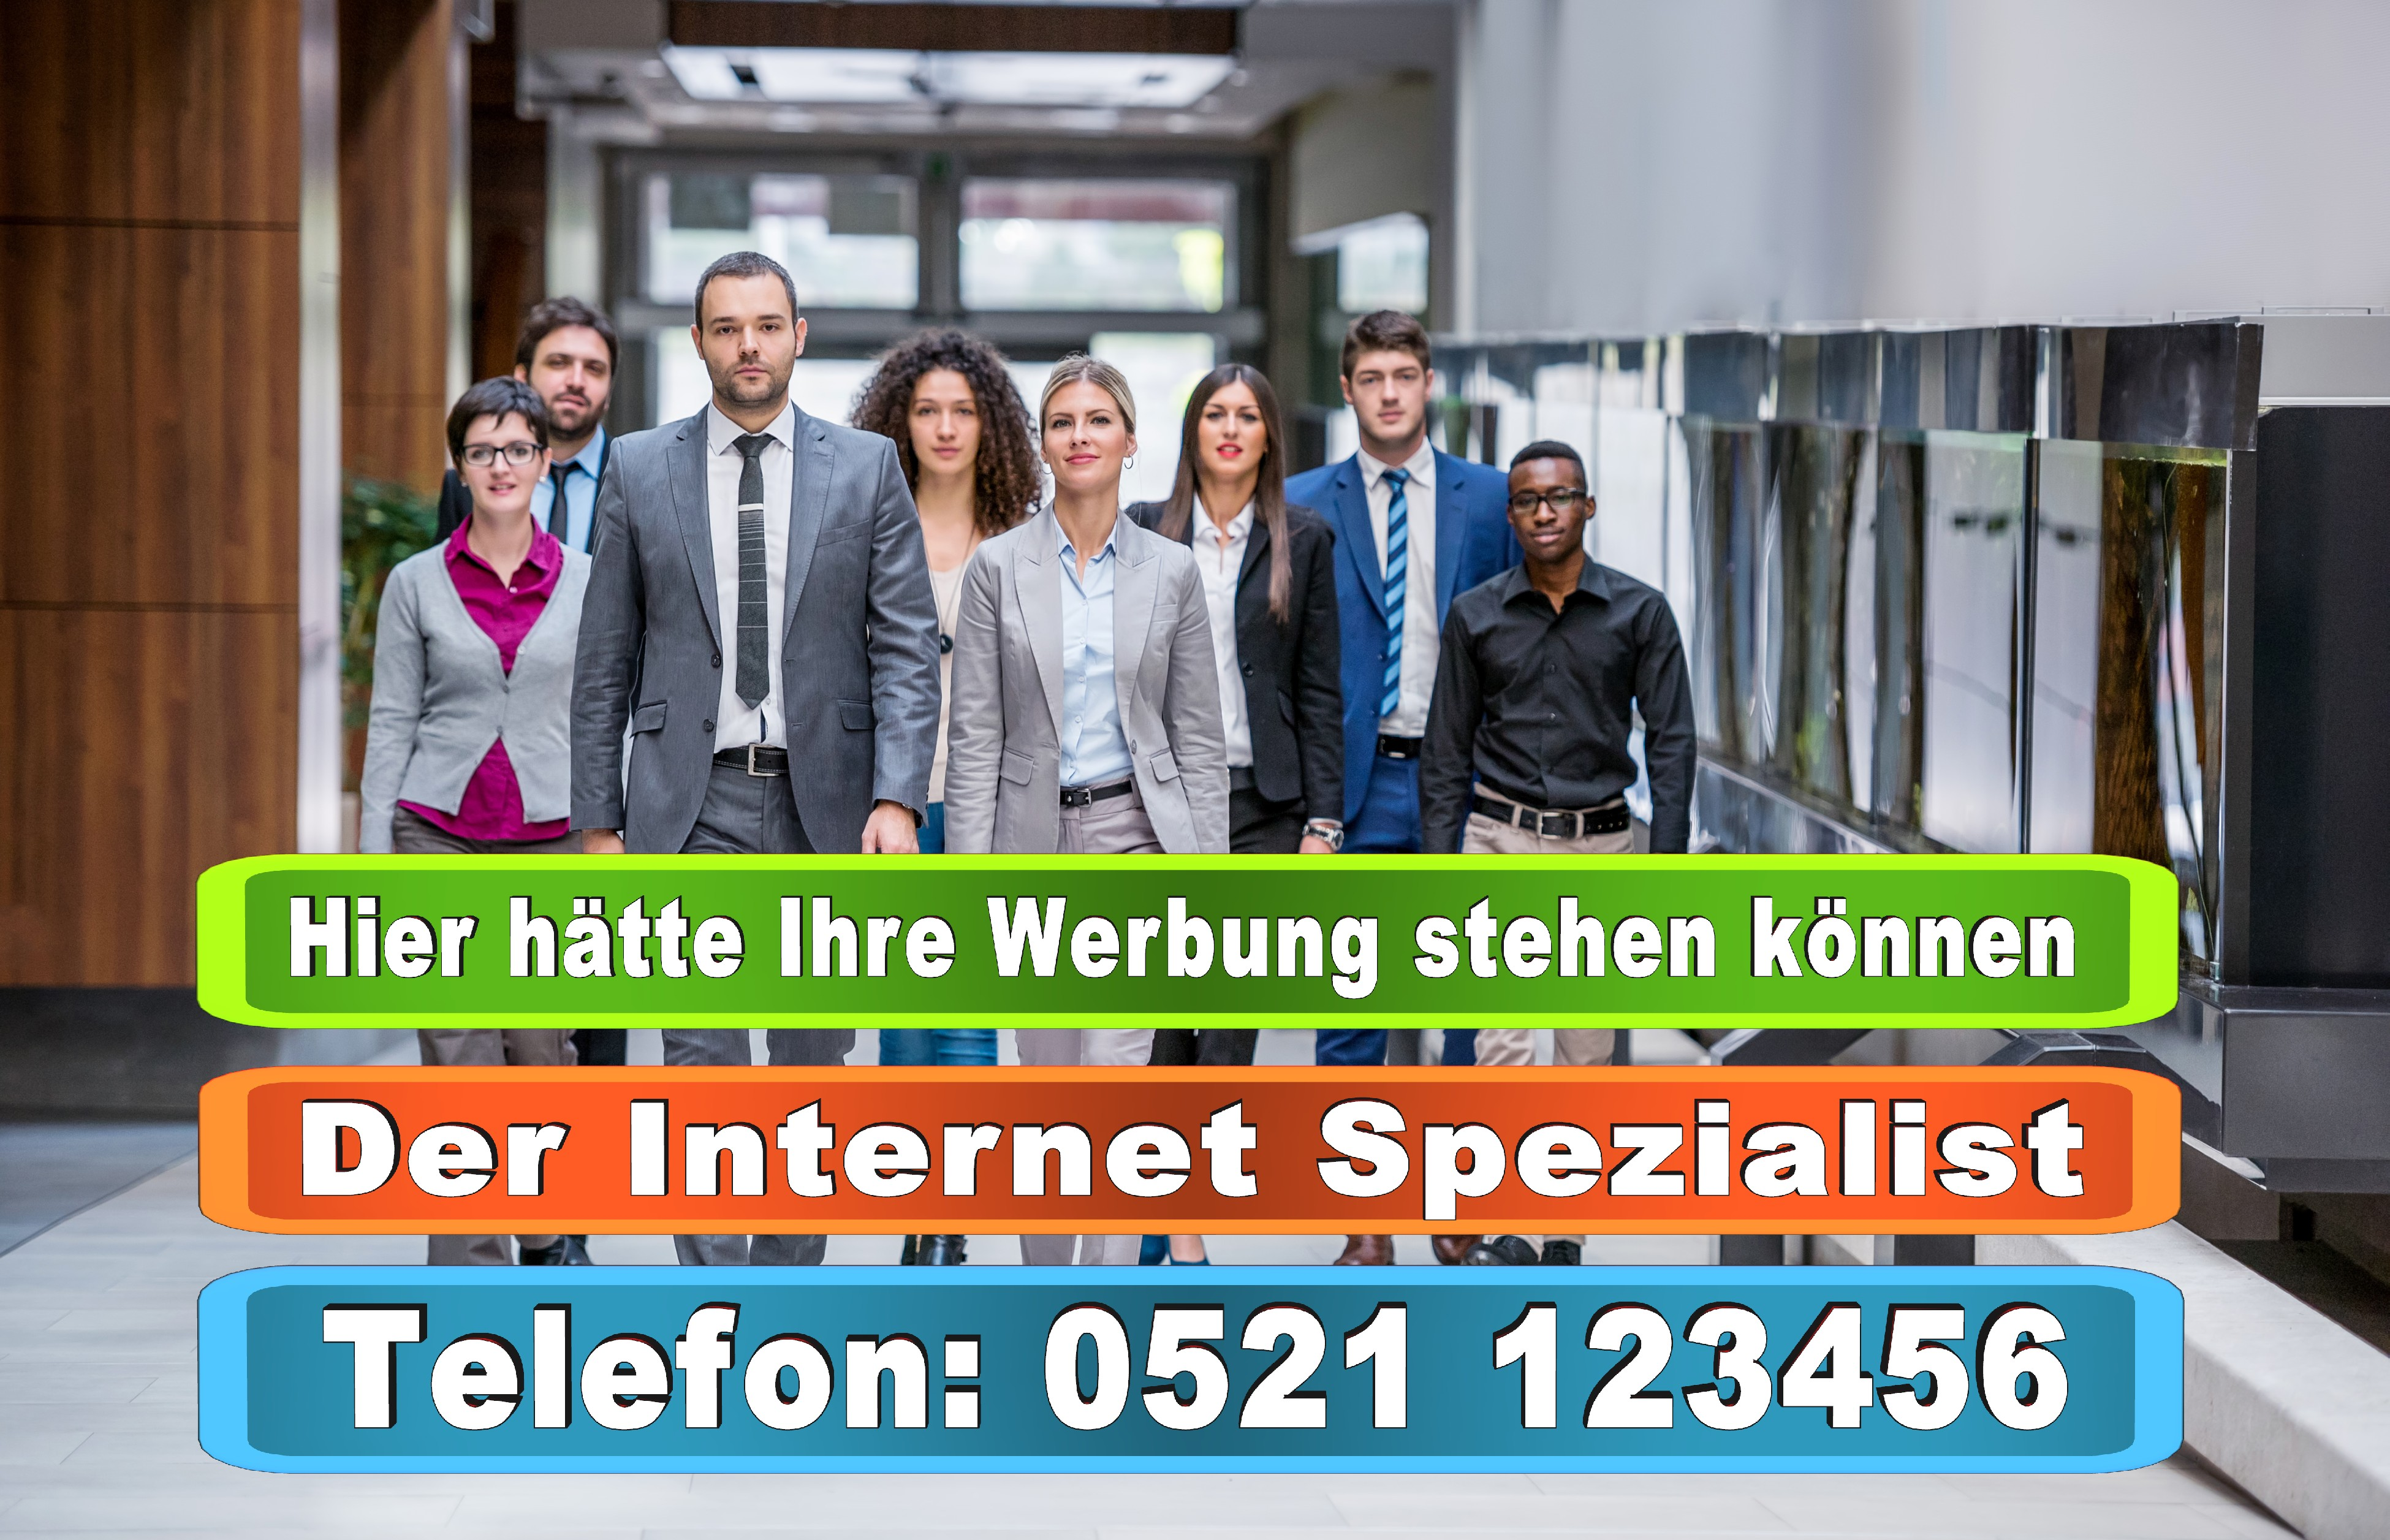 Rechtsanwaltskanzlei Bielefeld NRW OWL Rechtsanwalt Kanzlei Büro Steuerberater Bielefeld Architekt Bielefeld (23)